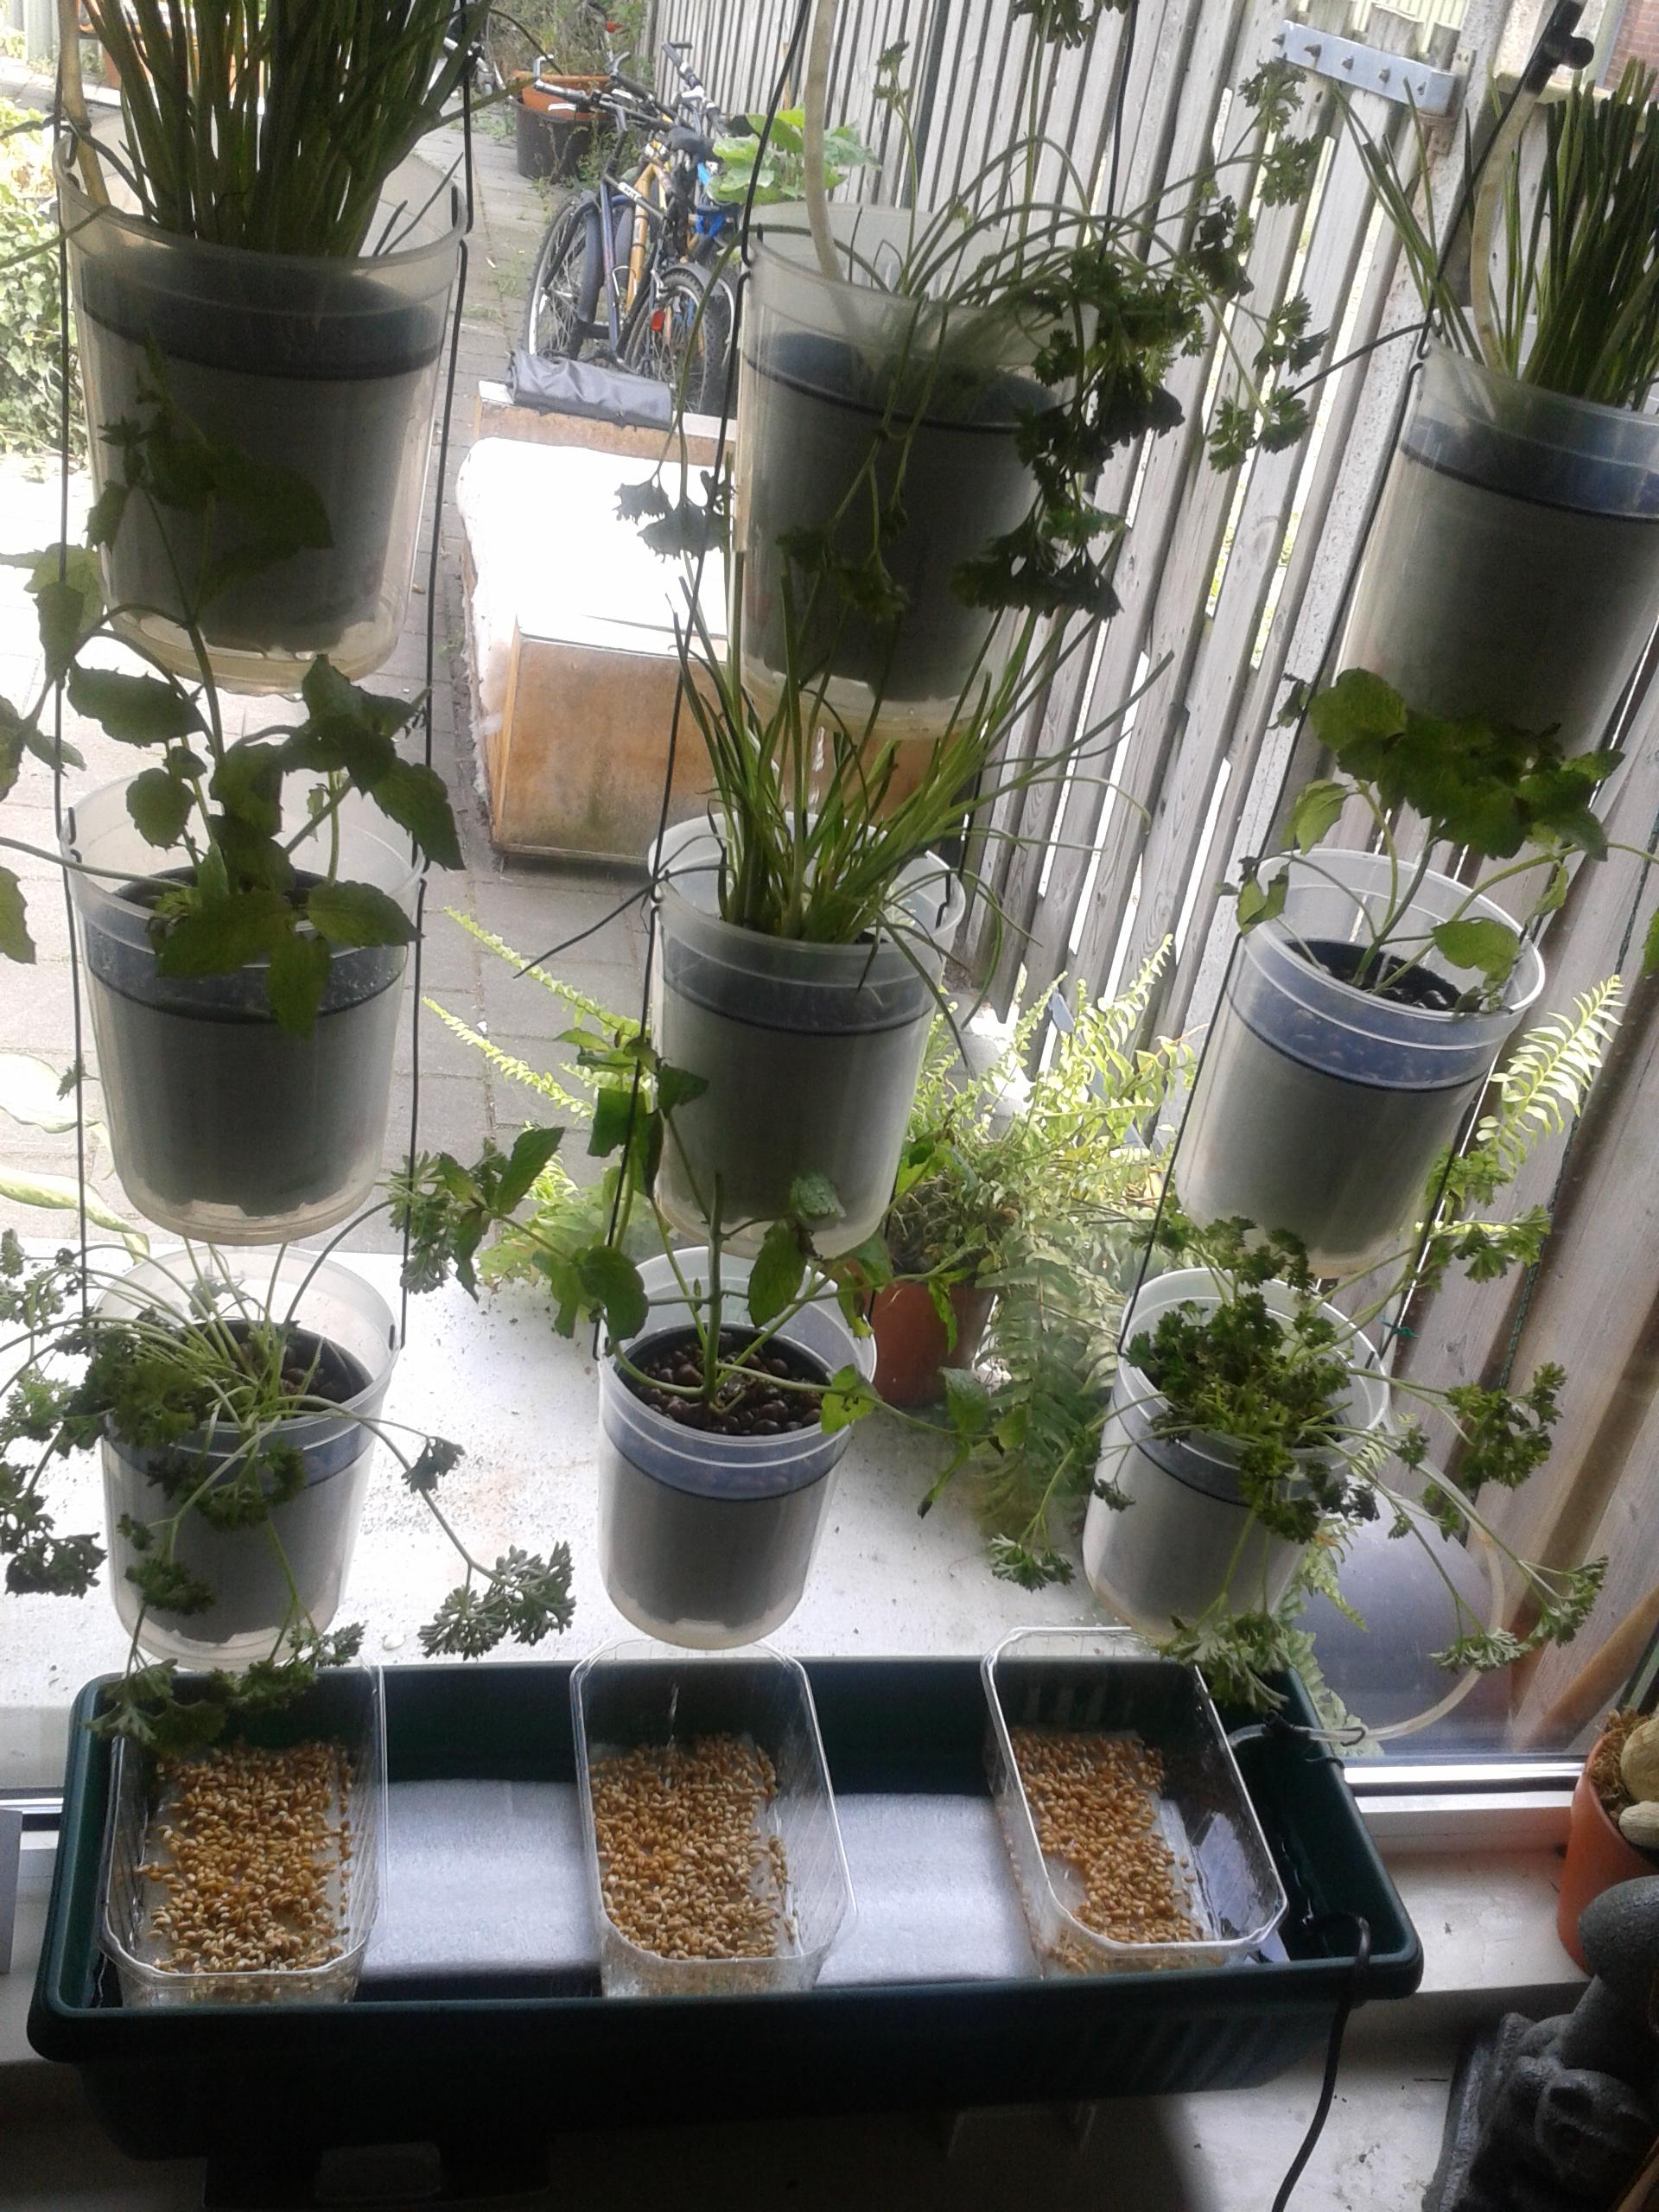 Windowfarm Modulair System (4)